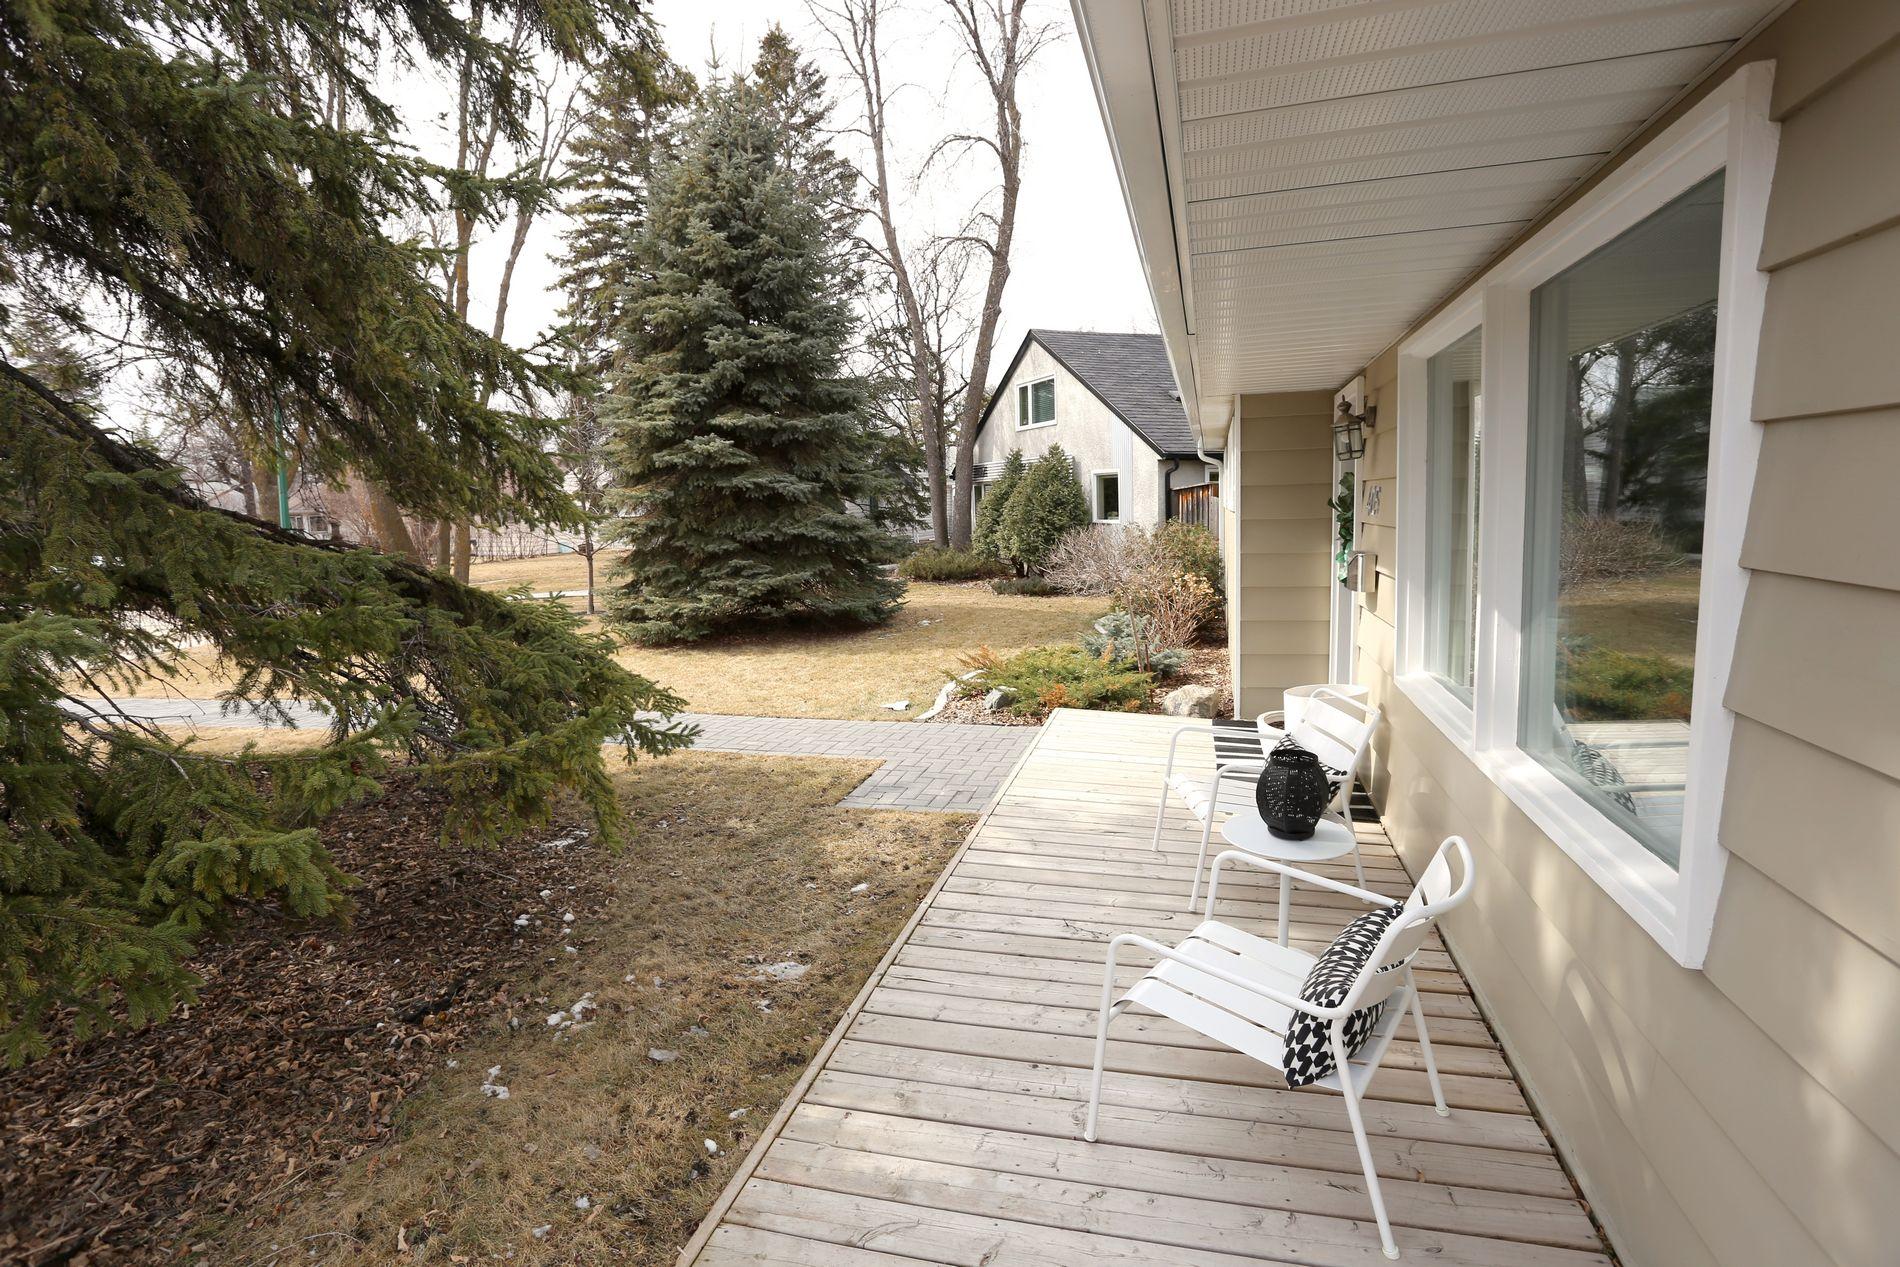 405 Lanark Street, Winnipeg, Manitoba  R3N 1L5 - Photo 21 - 1508190